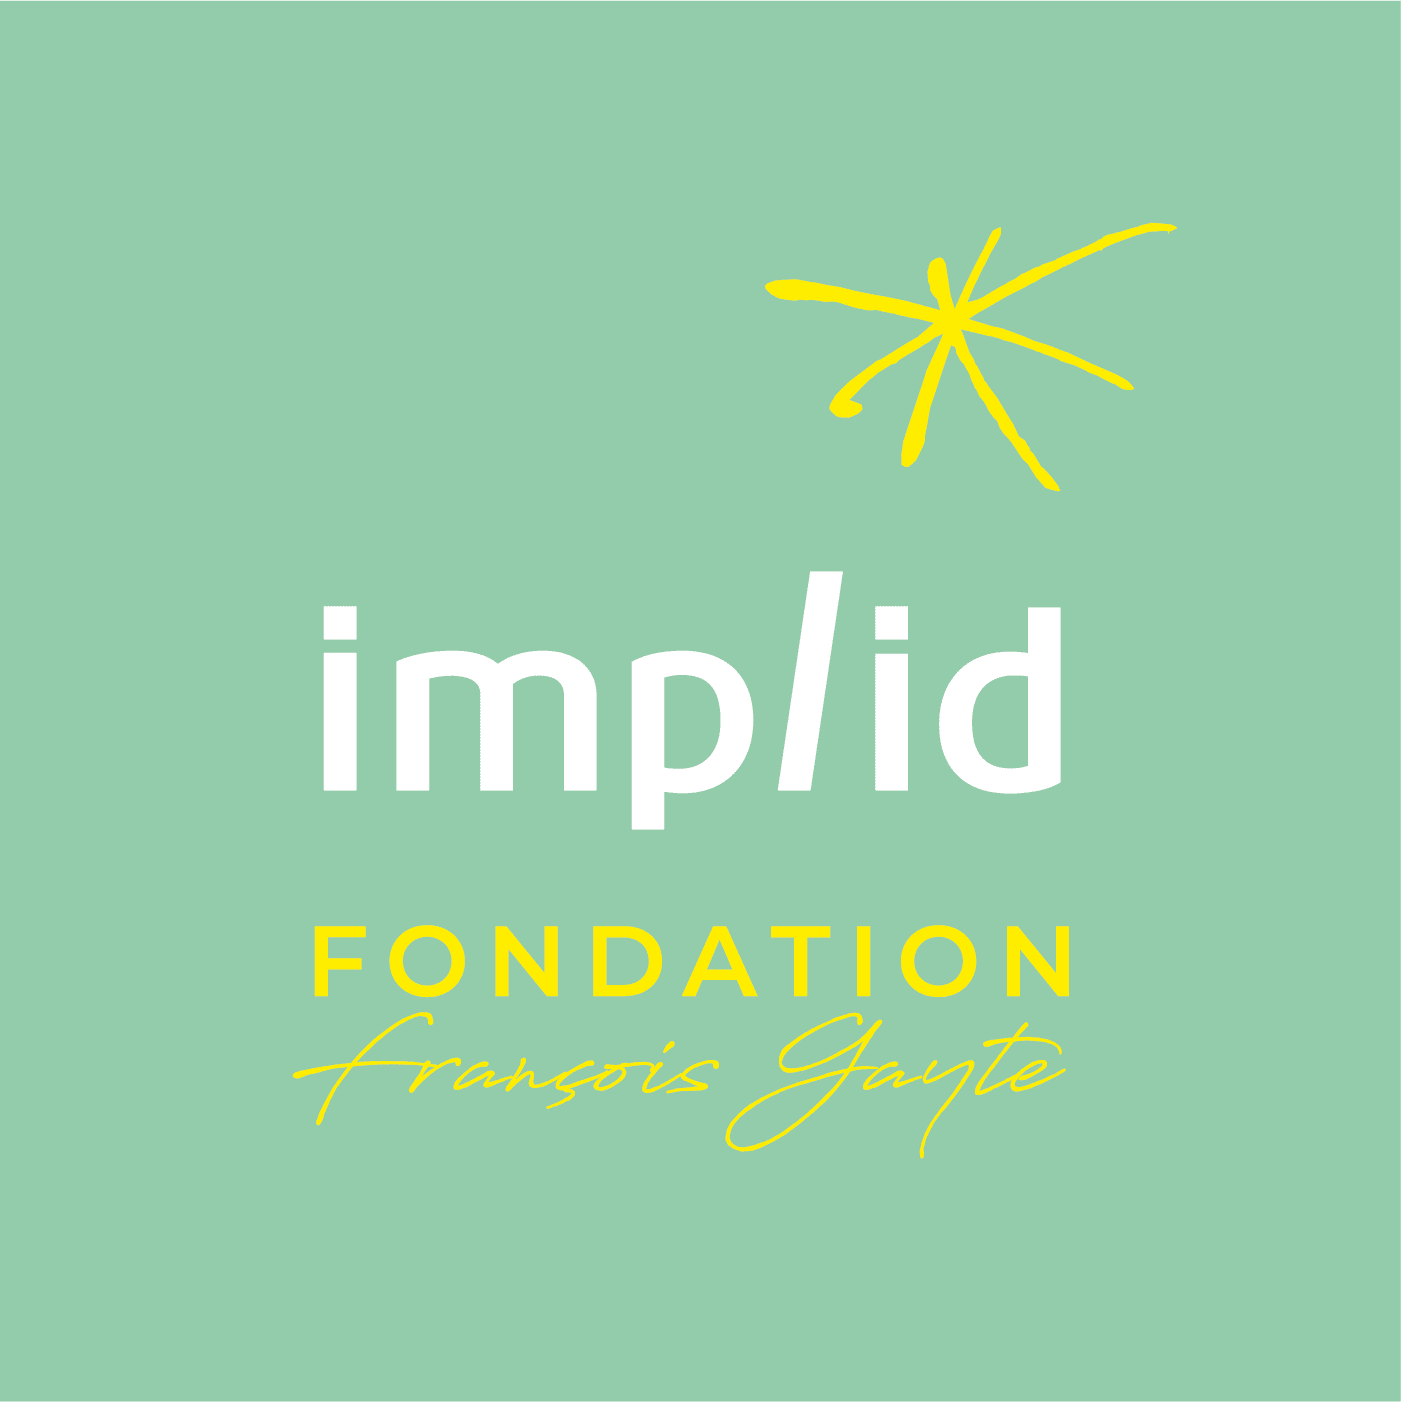 Fondation Implid